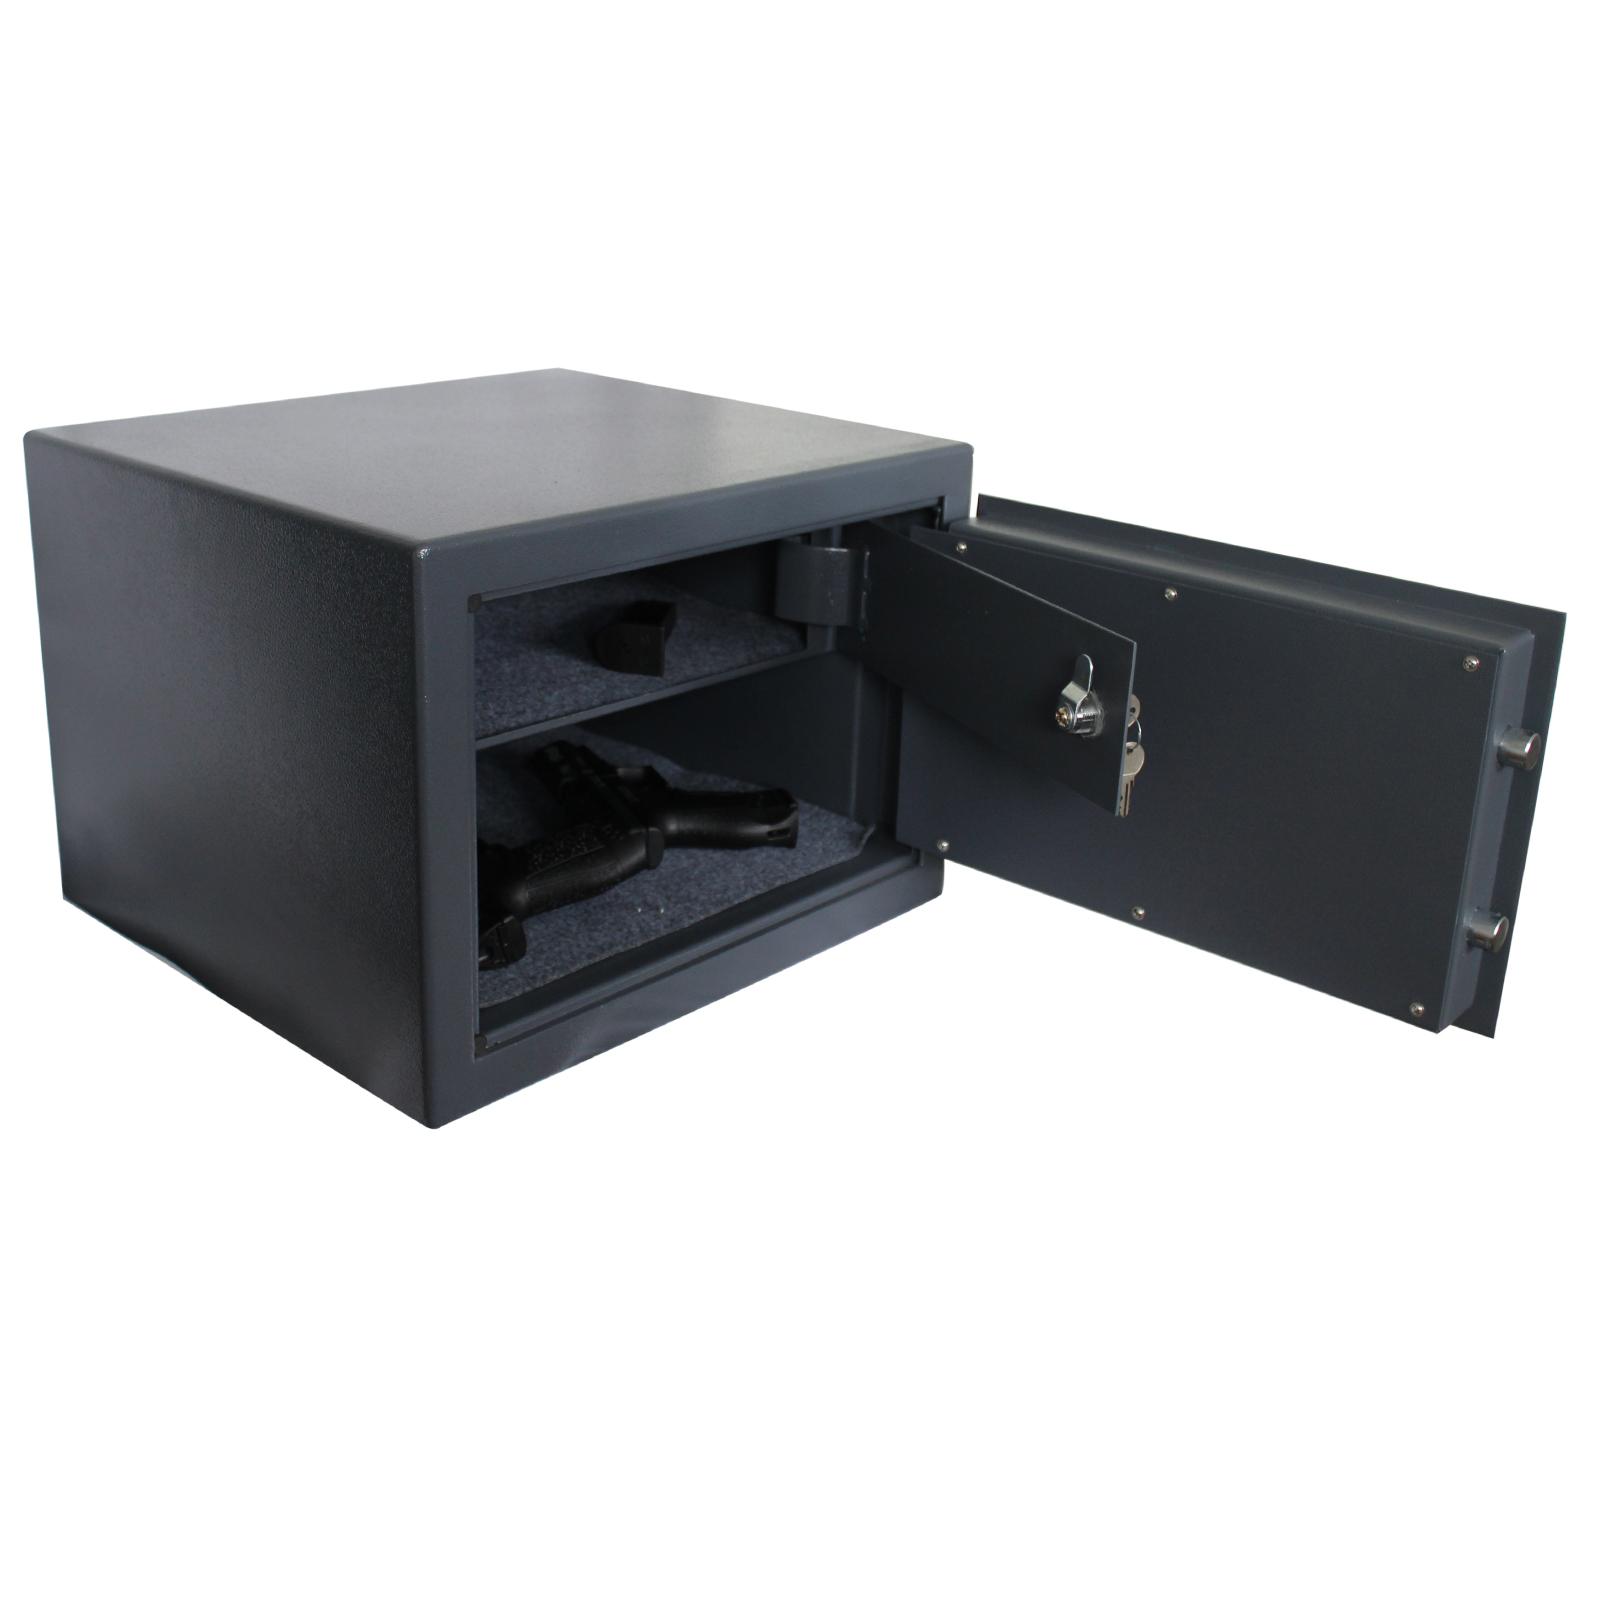 kurzwaffenschrank 420x380x300mm sicherheitsstufe b vdma 24992 tresor ebay. Black Bedroom Furniture Sets. Home Design Ideas